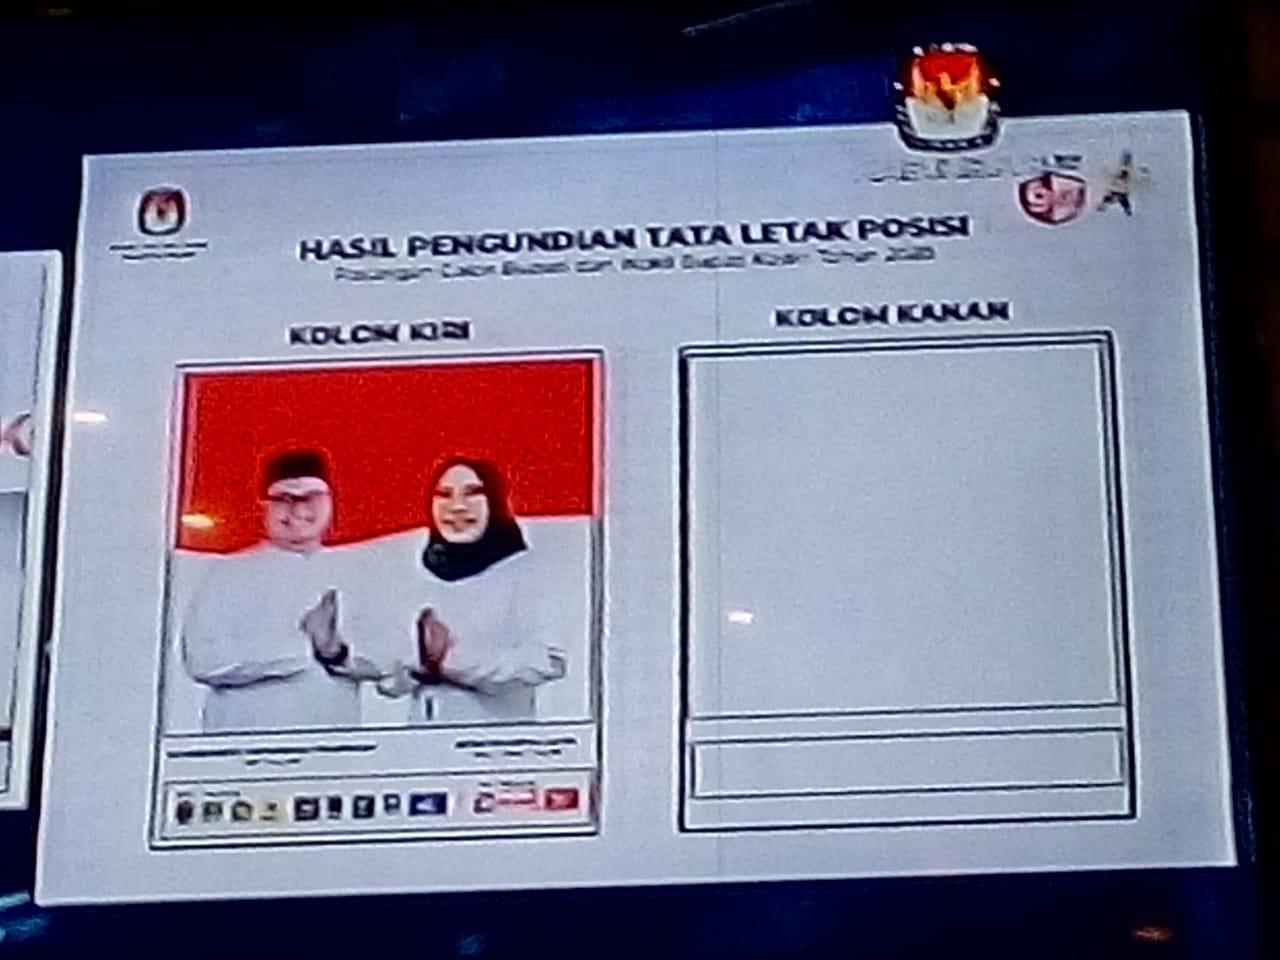 Pasangan Dhito-Dewi Dapat Posisi Sebelah Kiri Dalam Surat Suara Pilkada Kab.Kediri 2020